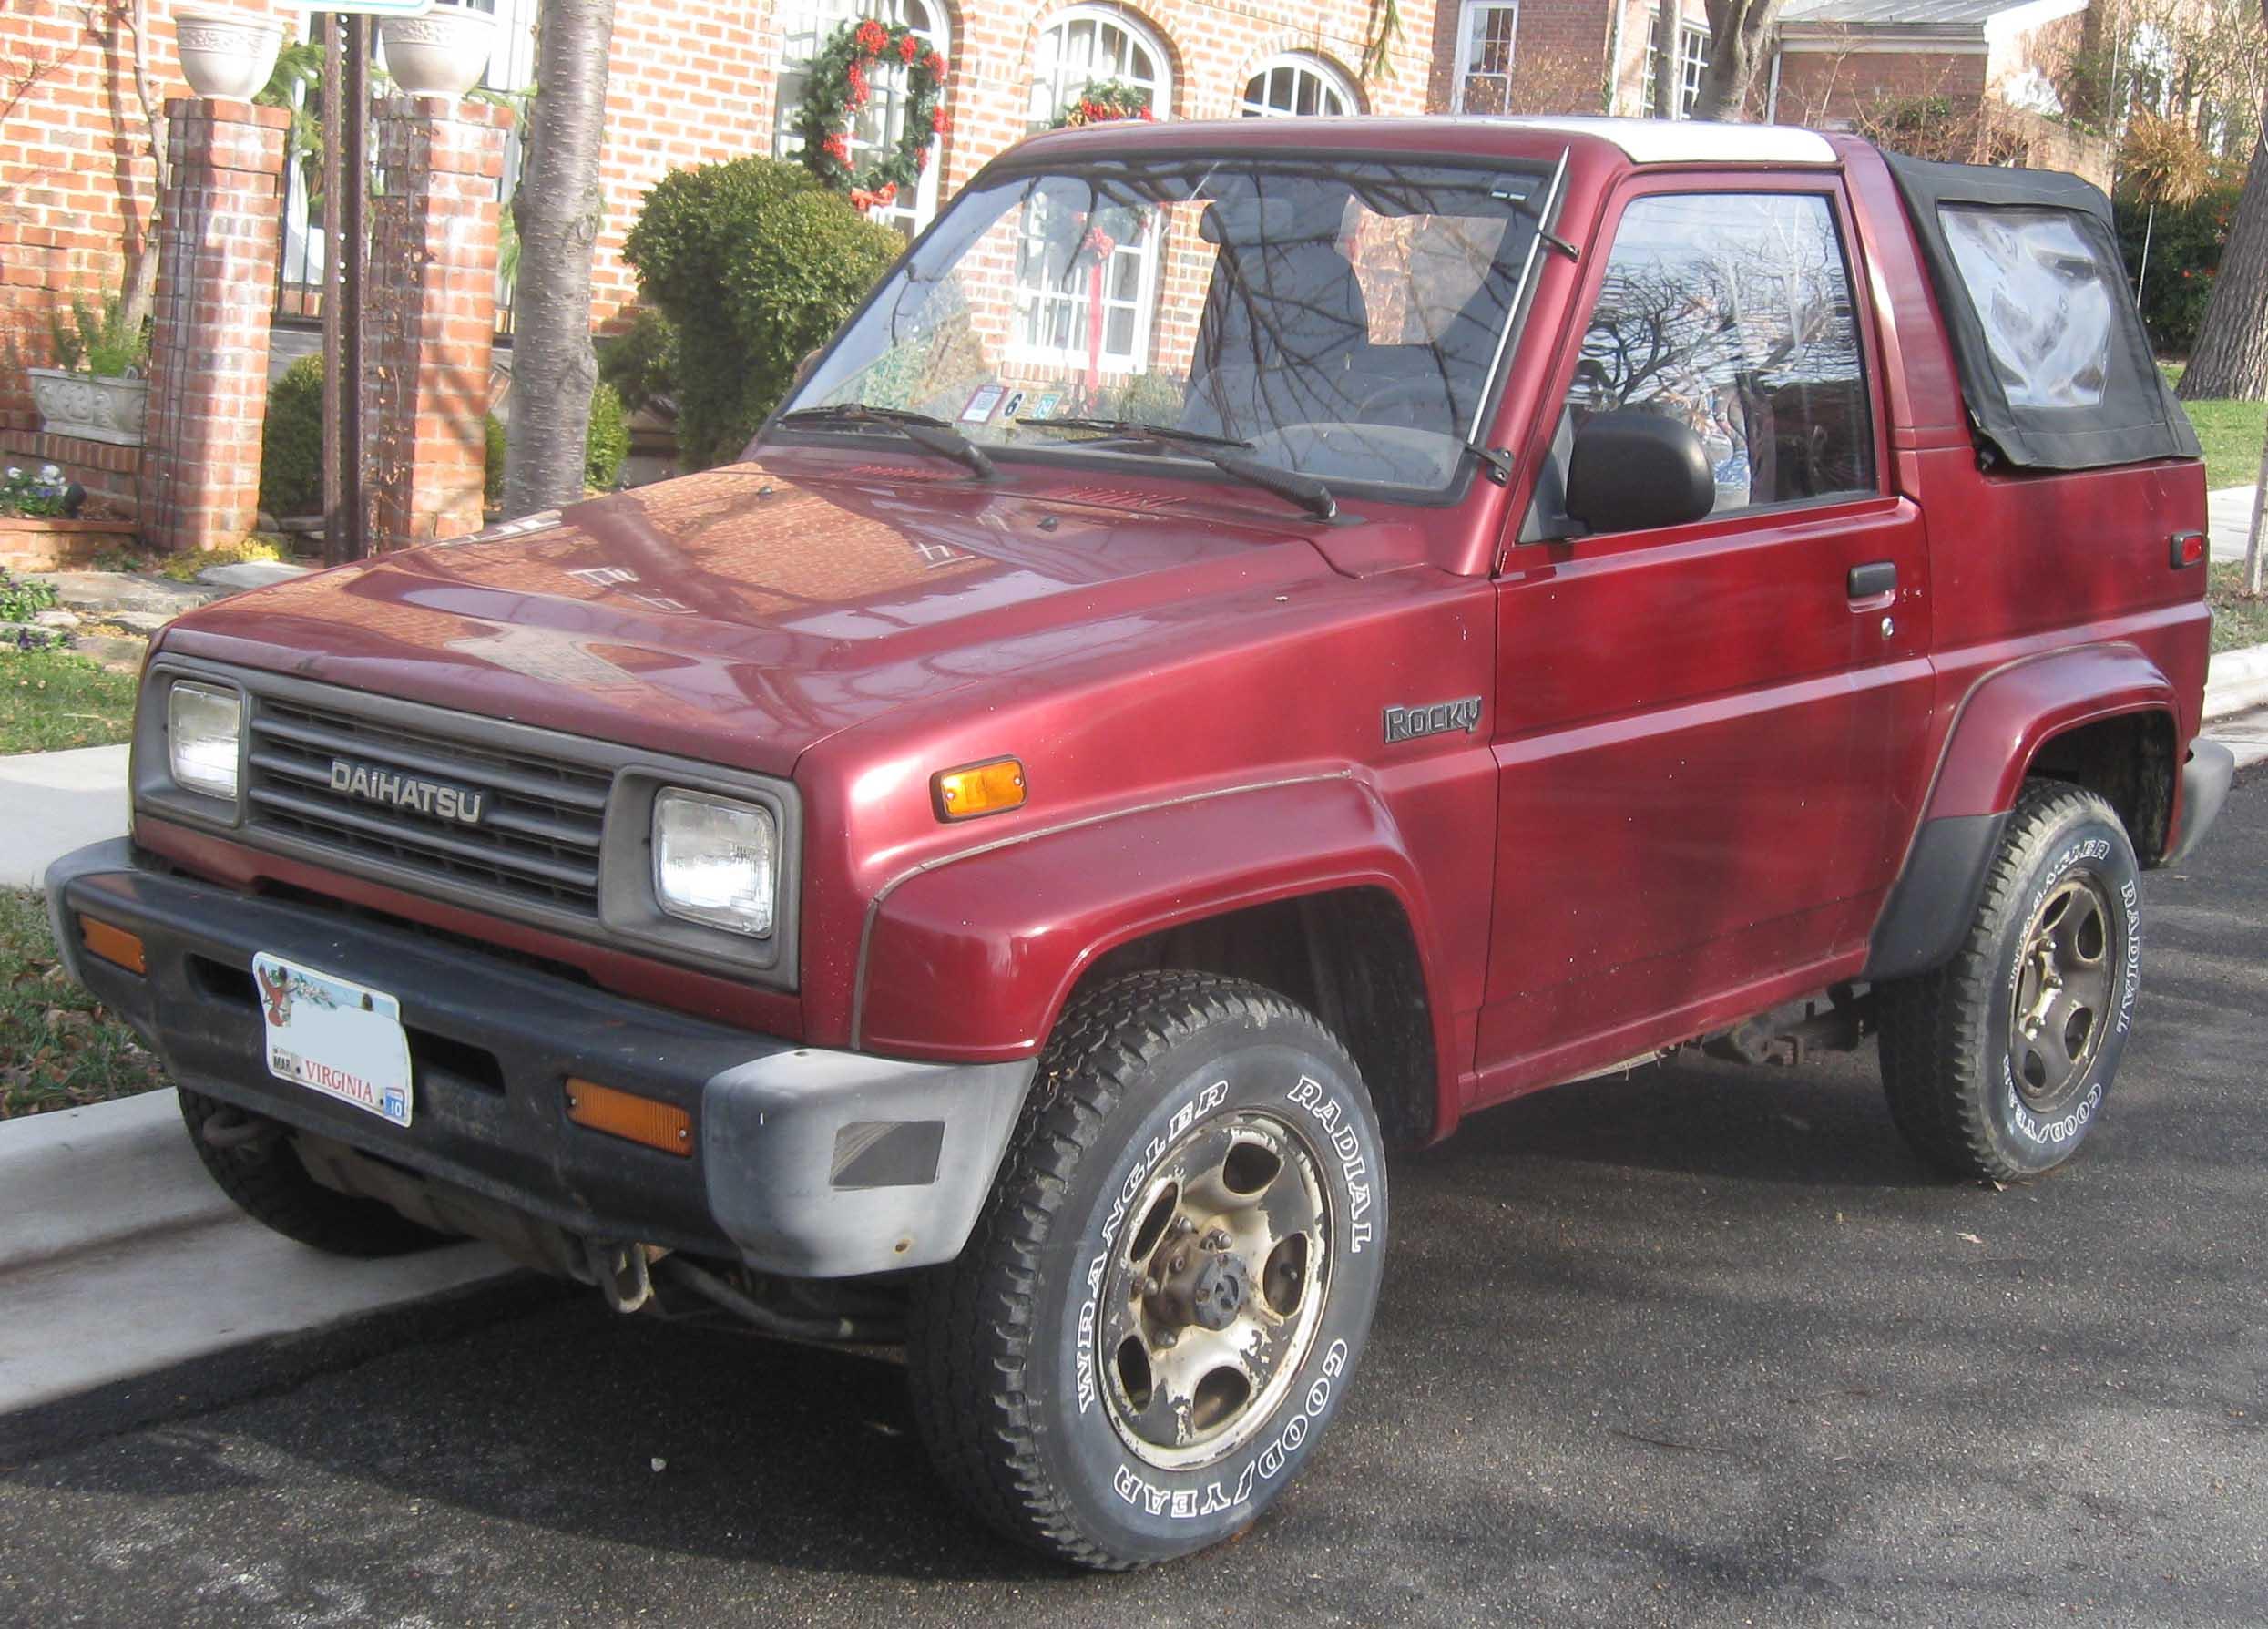 Daihatsu Feroza 1989 - 1999 SUV 3 door #1